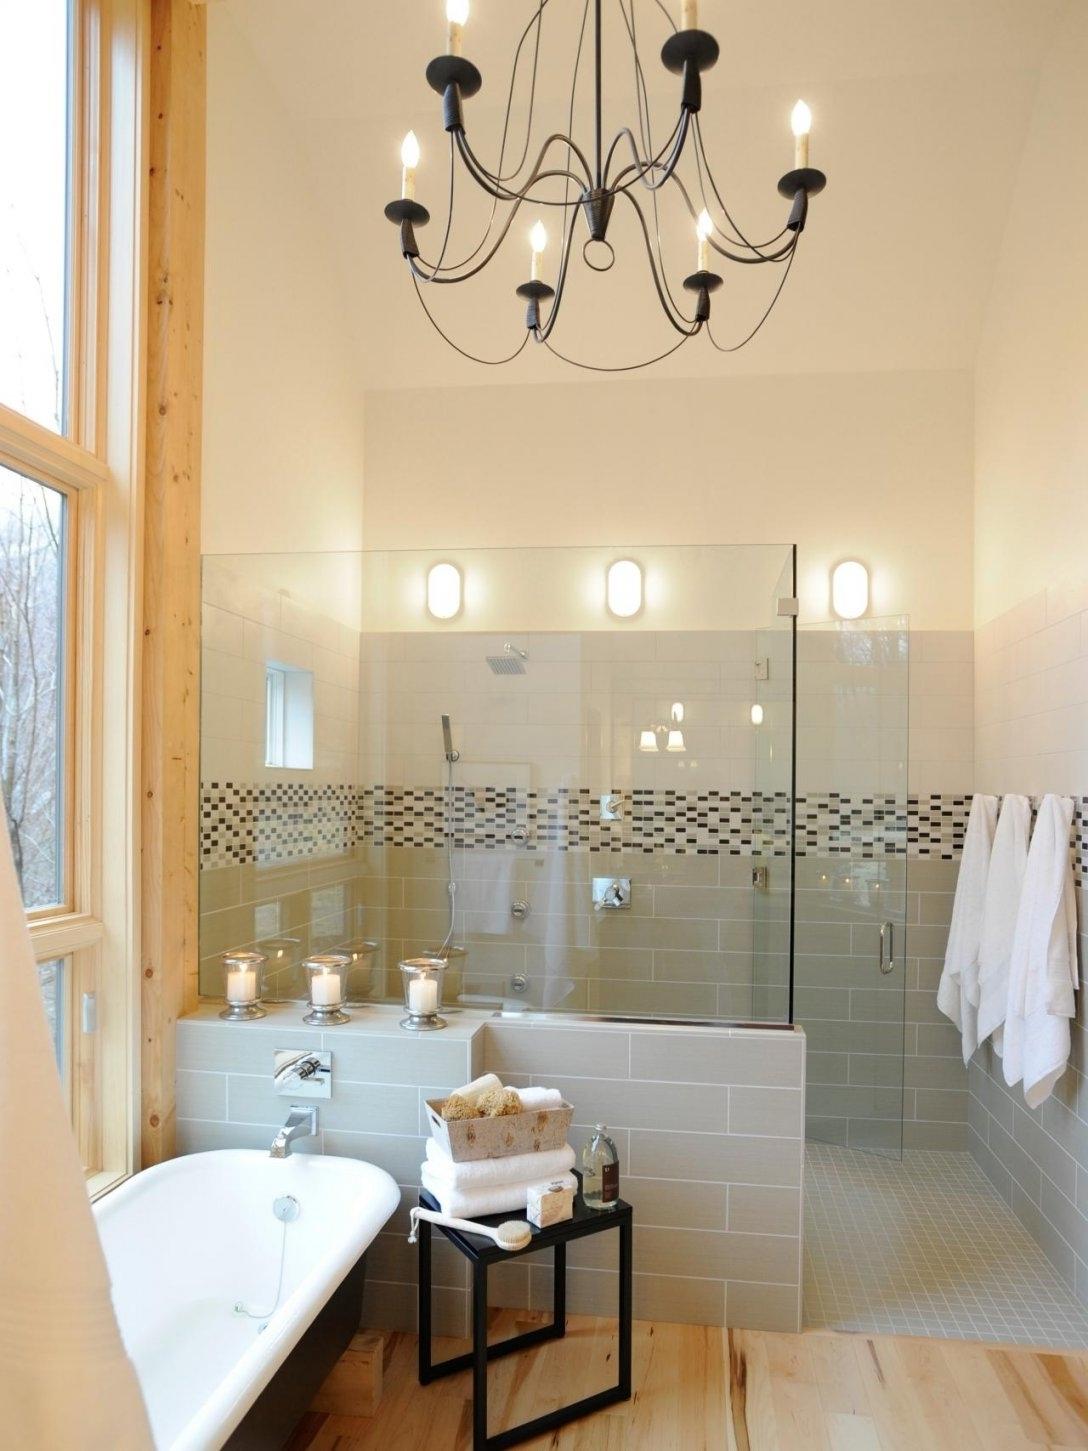 Preferred Modern Bathroom Chandeliers Ideas : Top Bathroom – Elegance And Inside Bathroom Chandeliers (View 15 of 20)